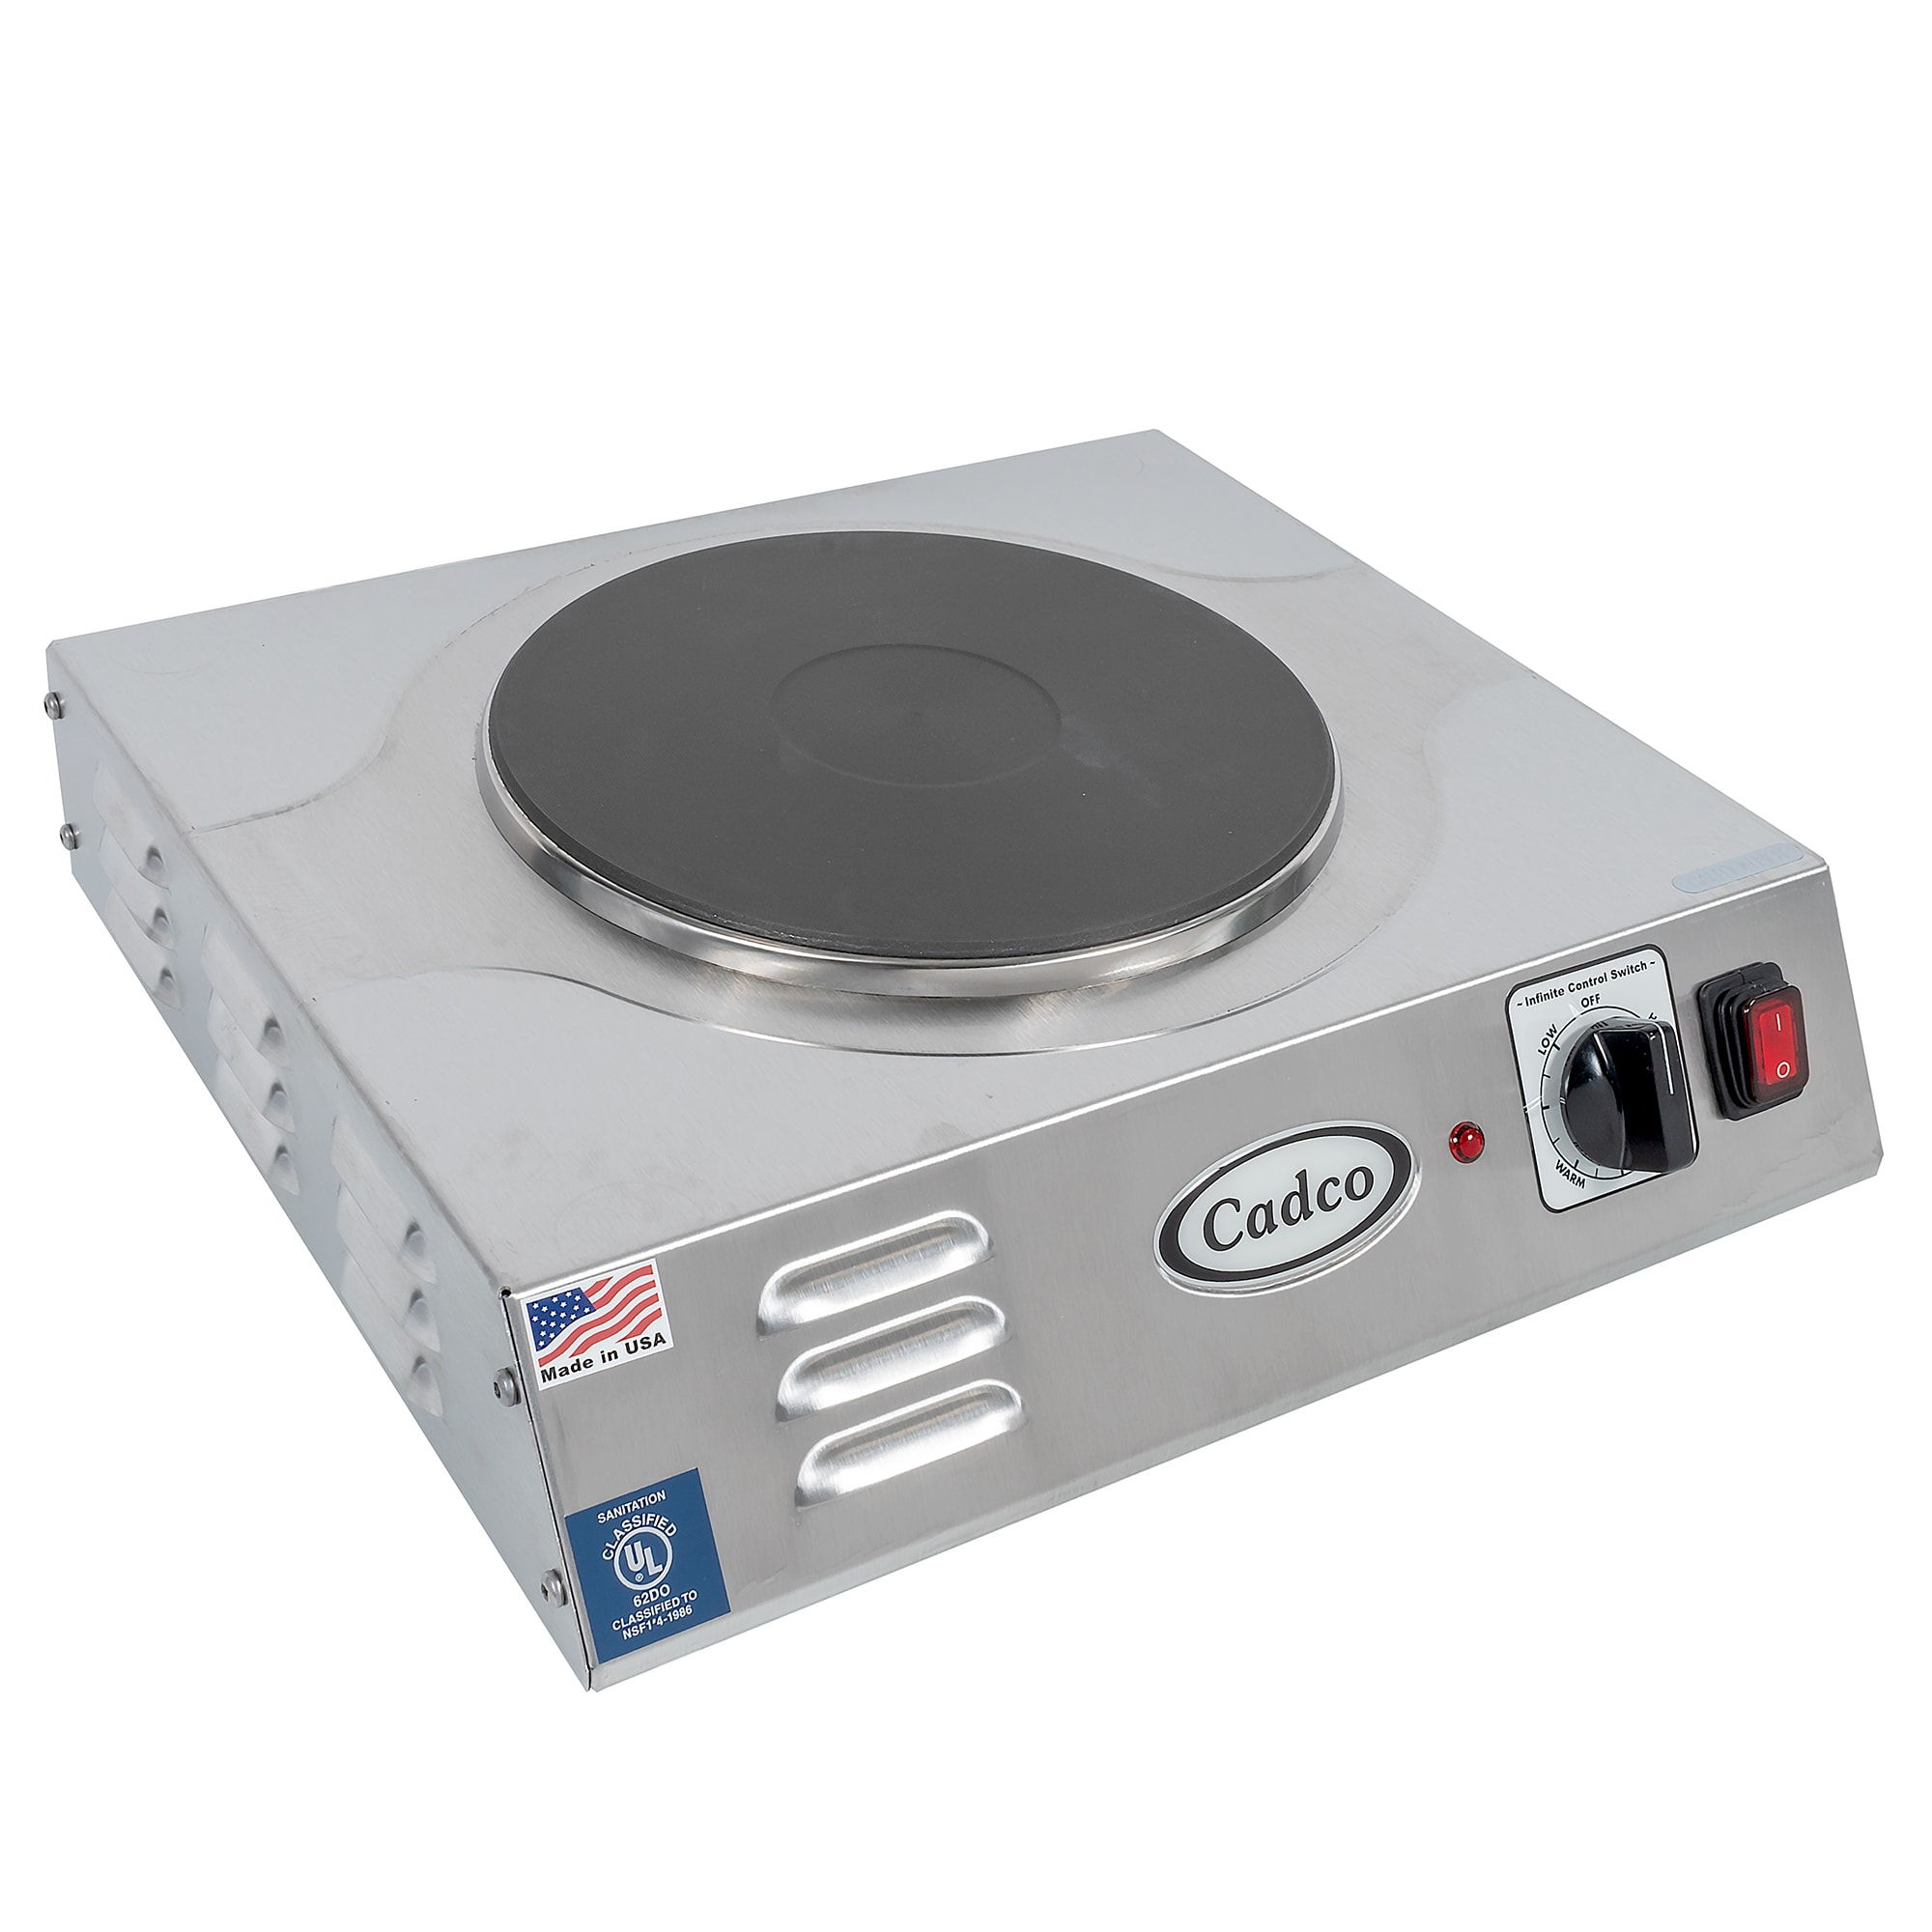 "Cadco LKR-220 15"" Electric Hotplate w/ (1) Burner & Infinite Controls, 220v/1ph"